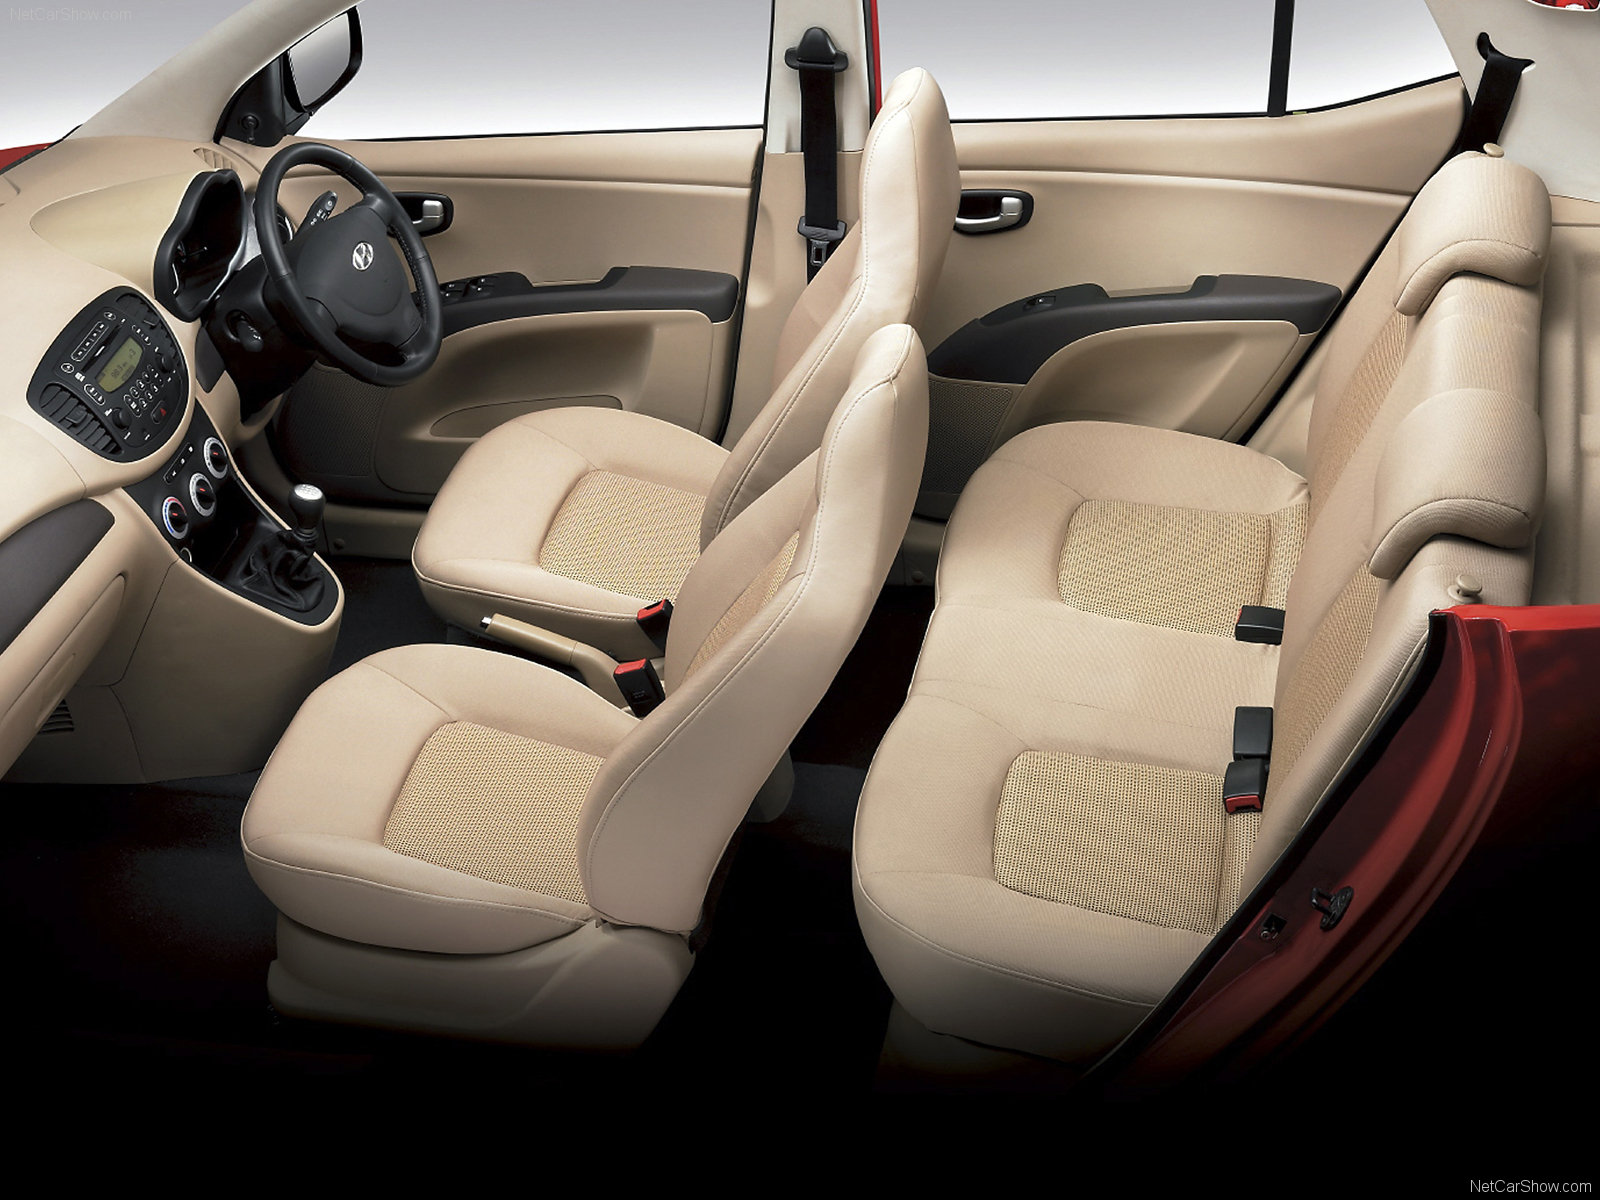 Hyundai i10 Magna Features: